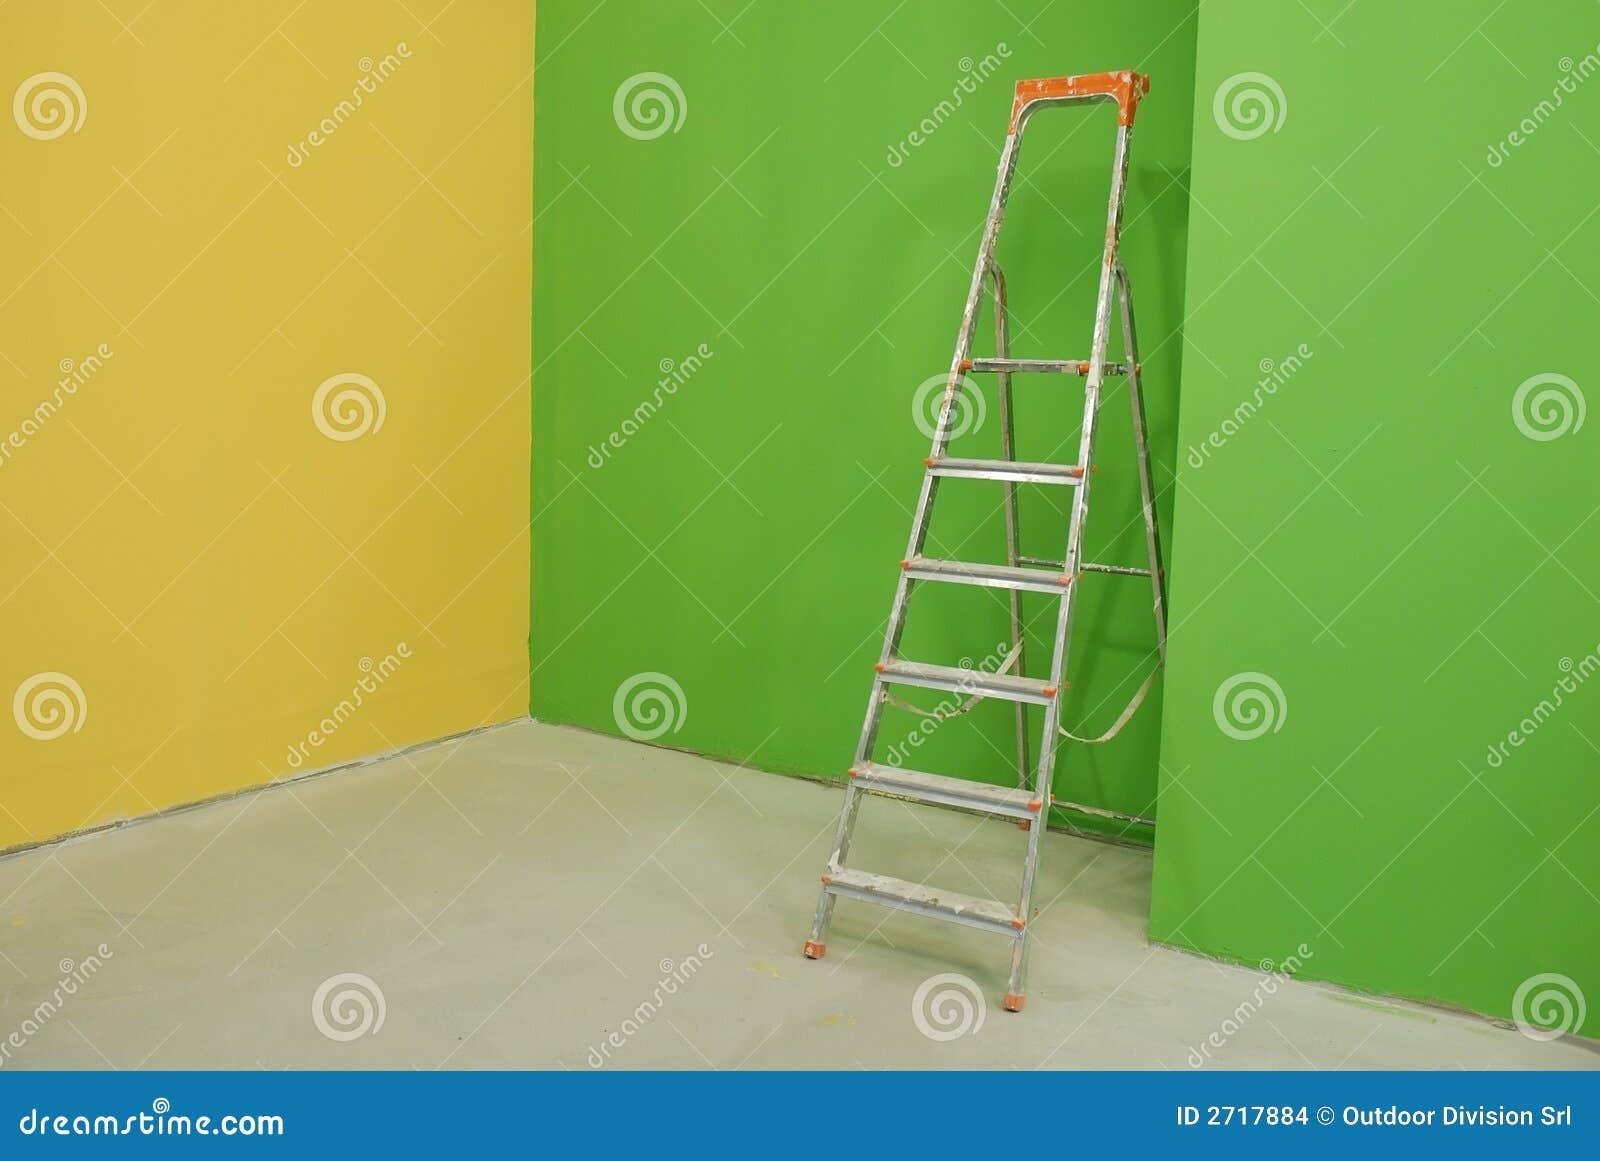 Escada por paredes pintadas foto de stock imagem de for Pintura de paredes interiores fotos